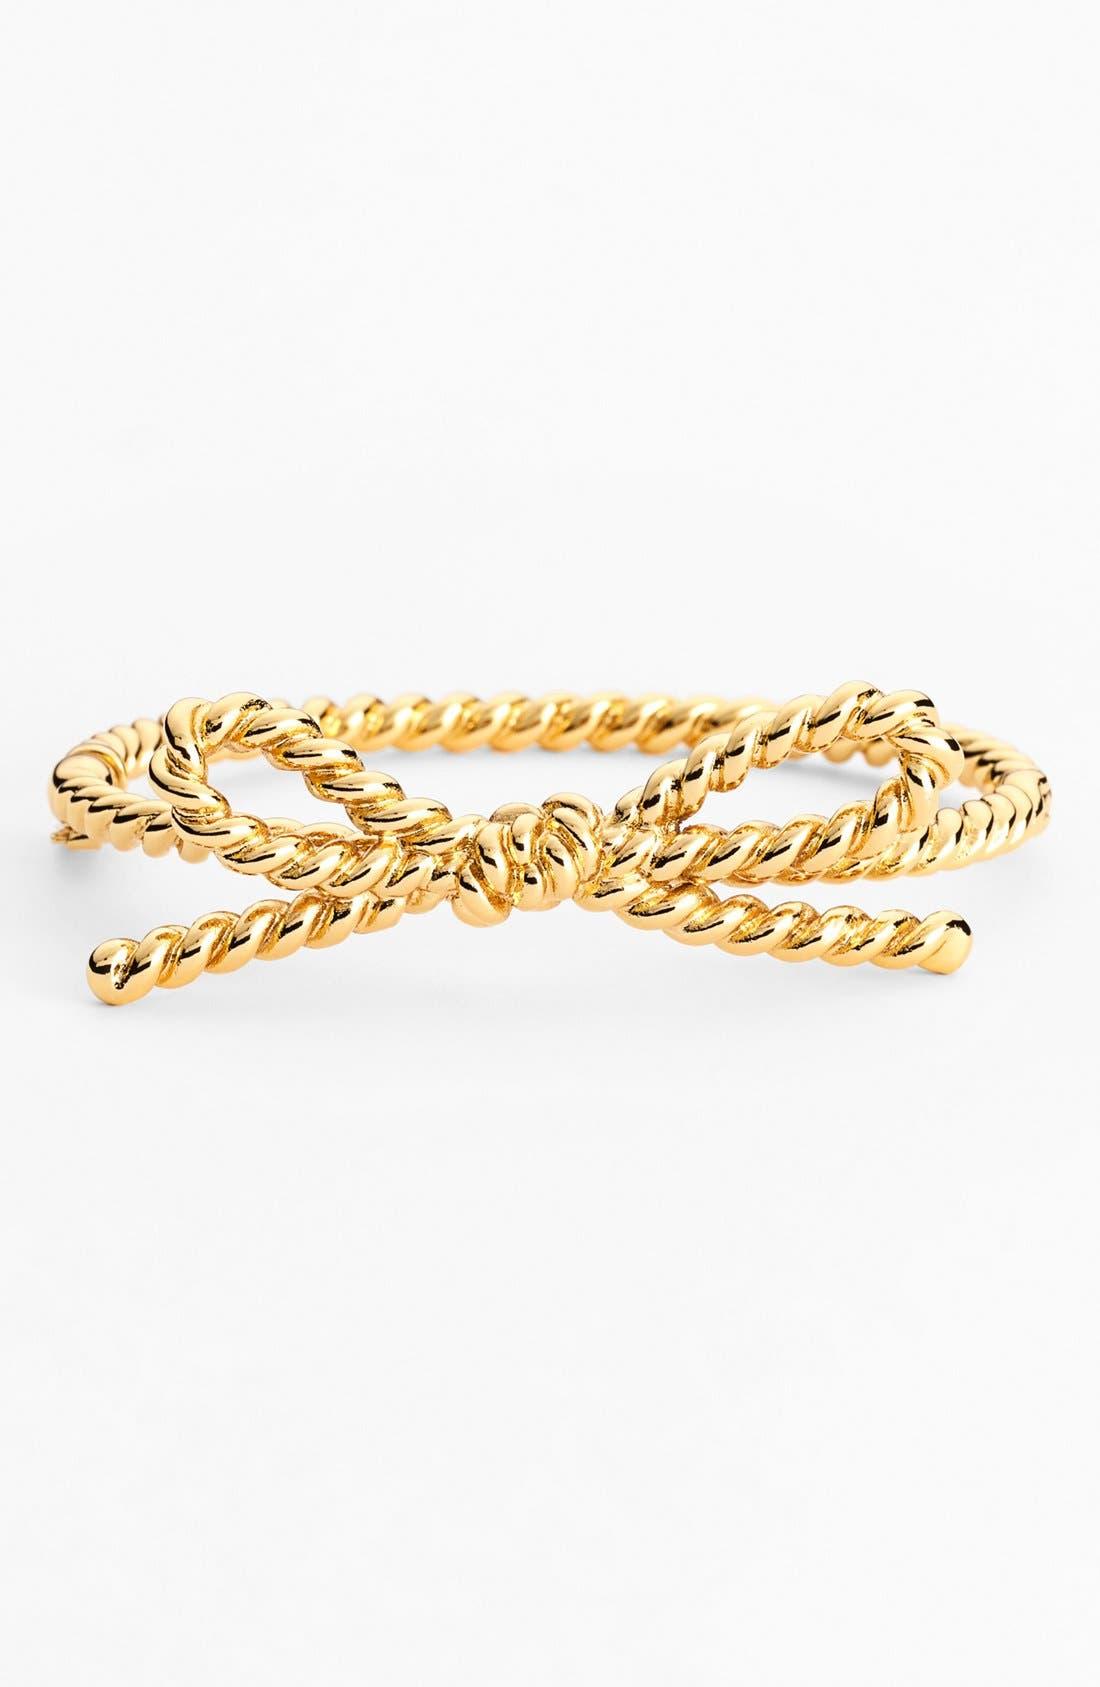 Main Image - kate spade new york 'skinny mini' rope bow bangle bracelet